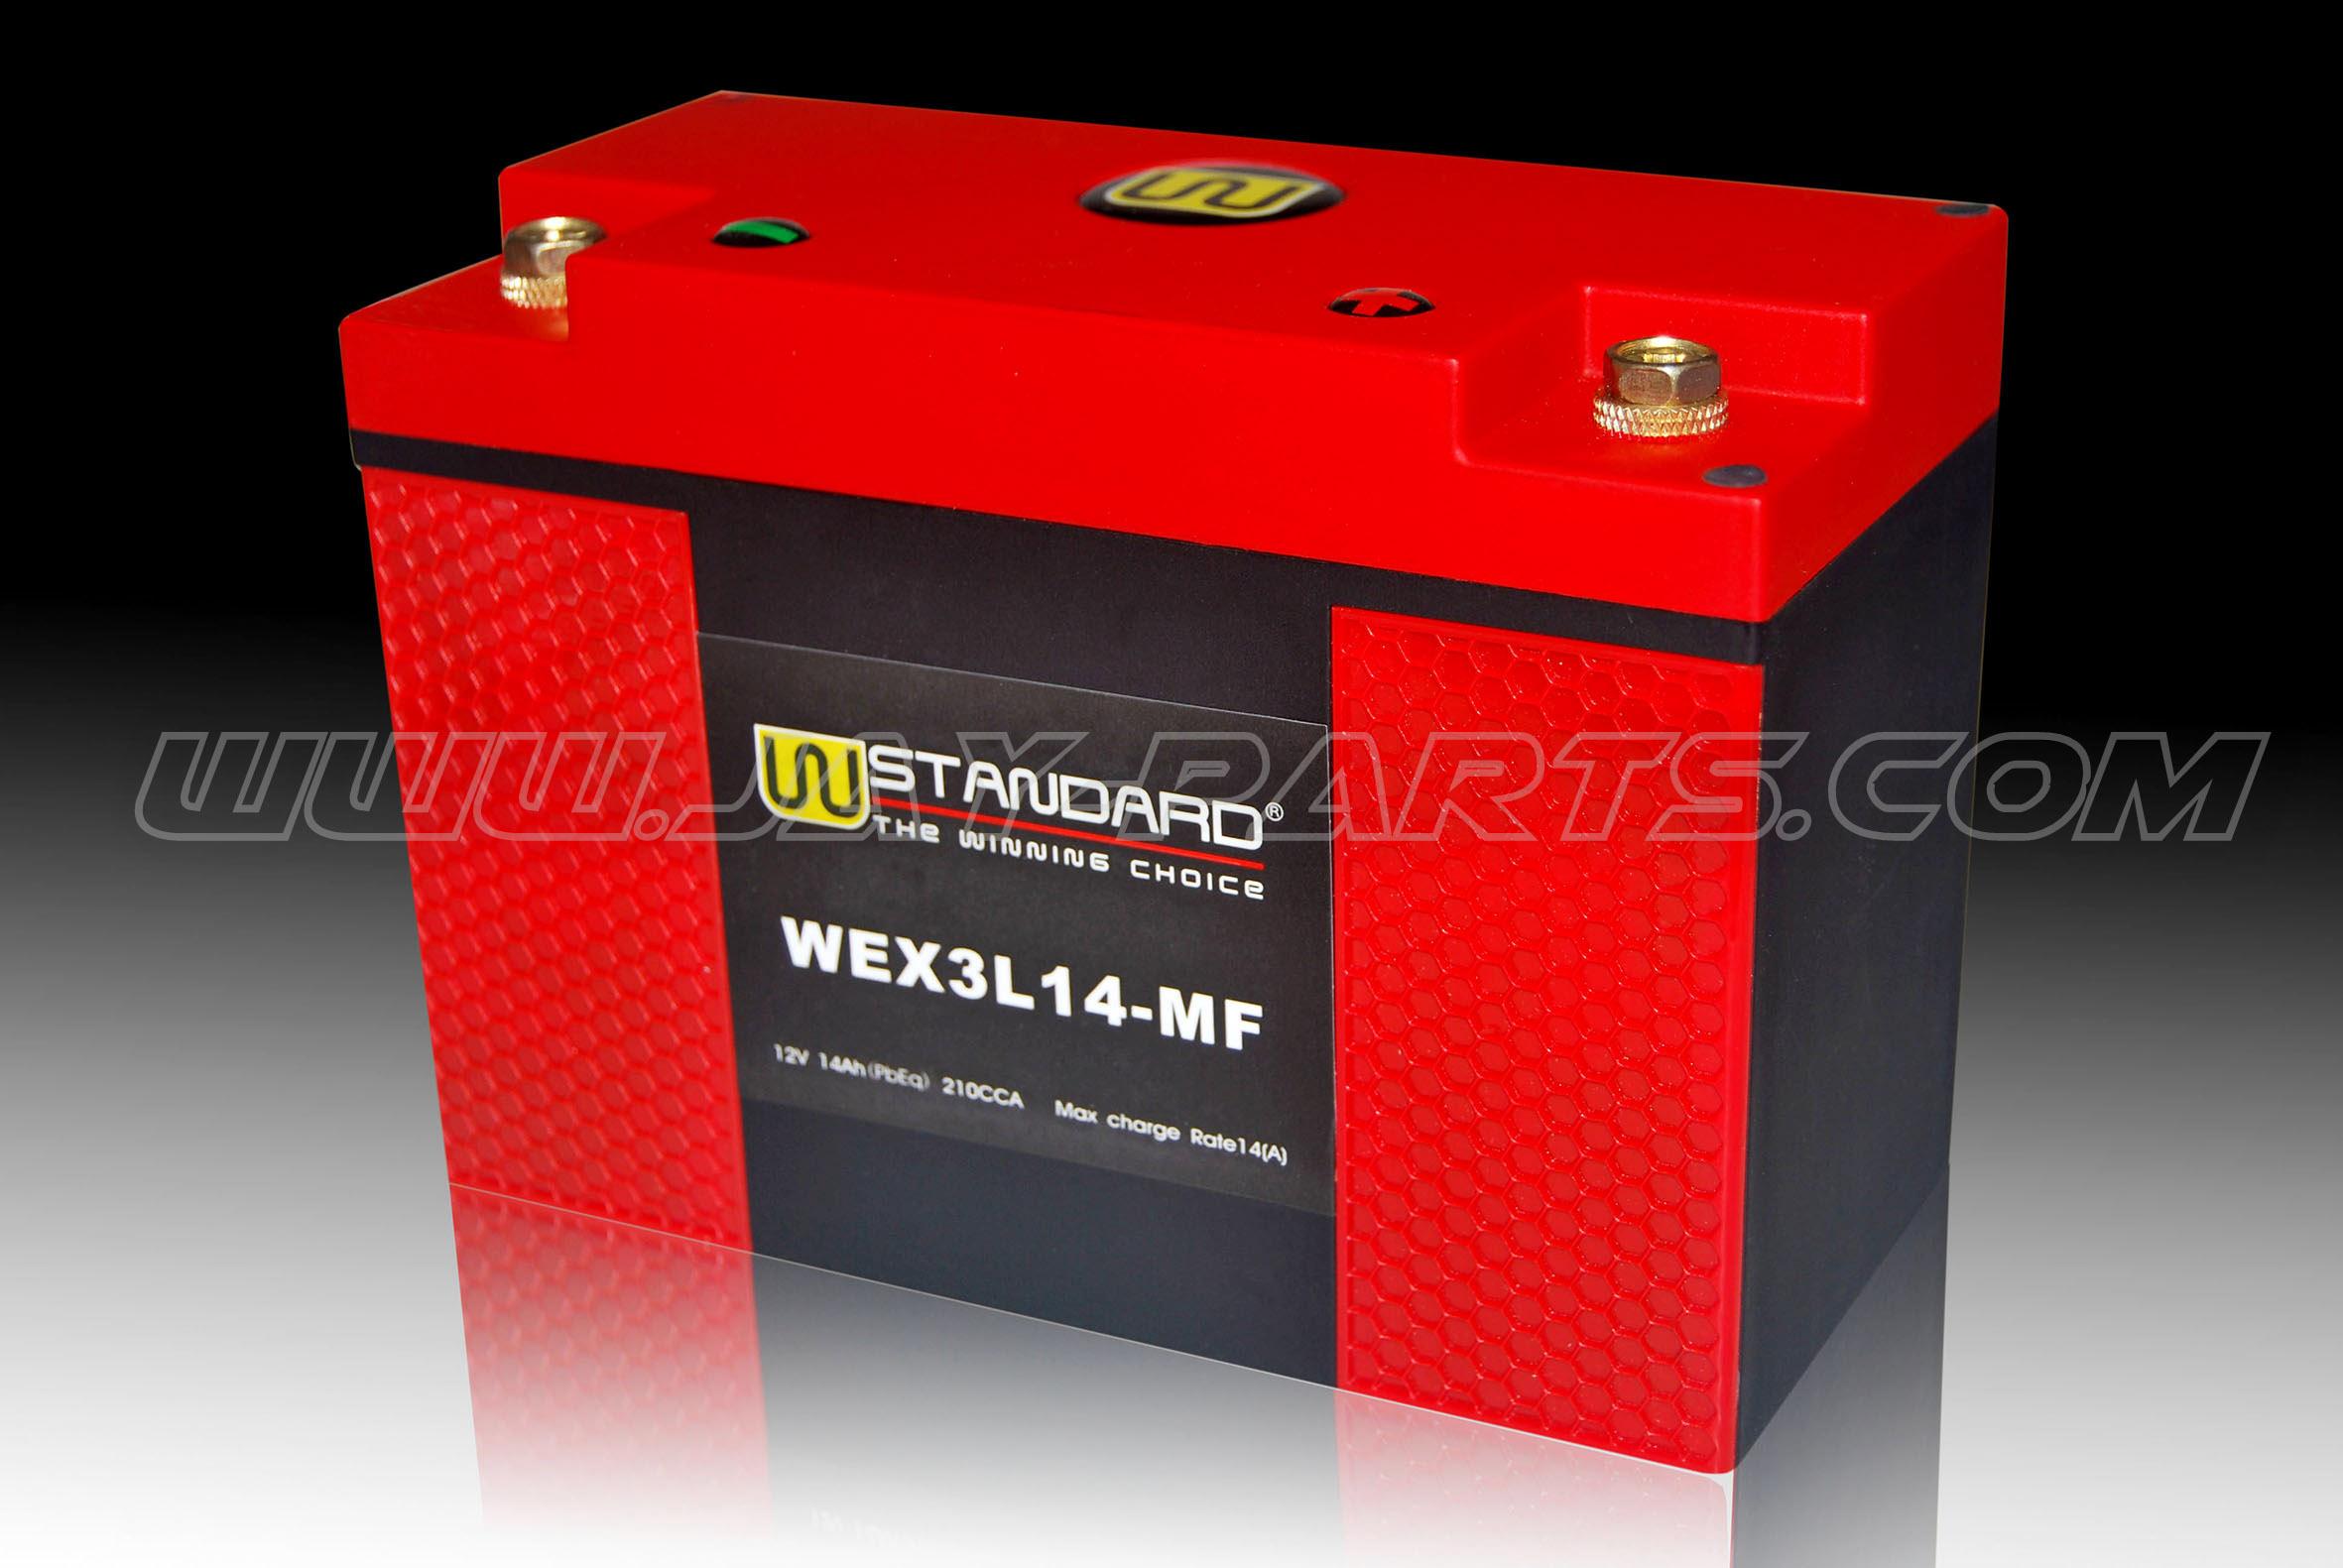 W-Standard-Lithium Batterie WEX3L14-MF